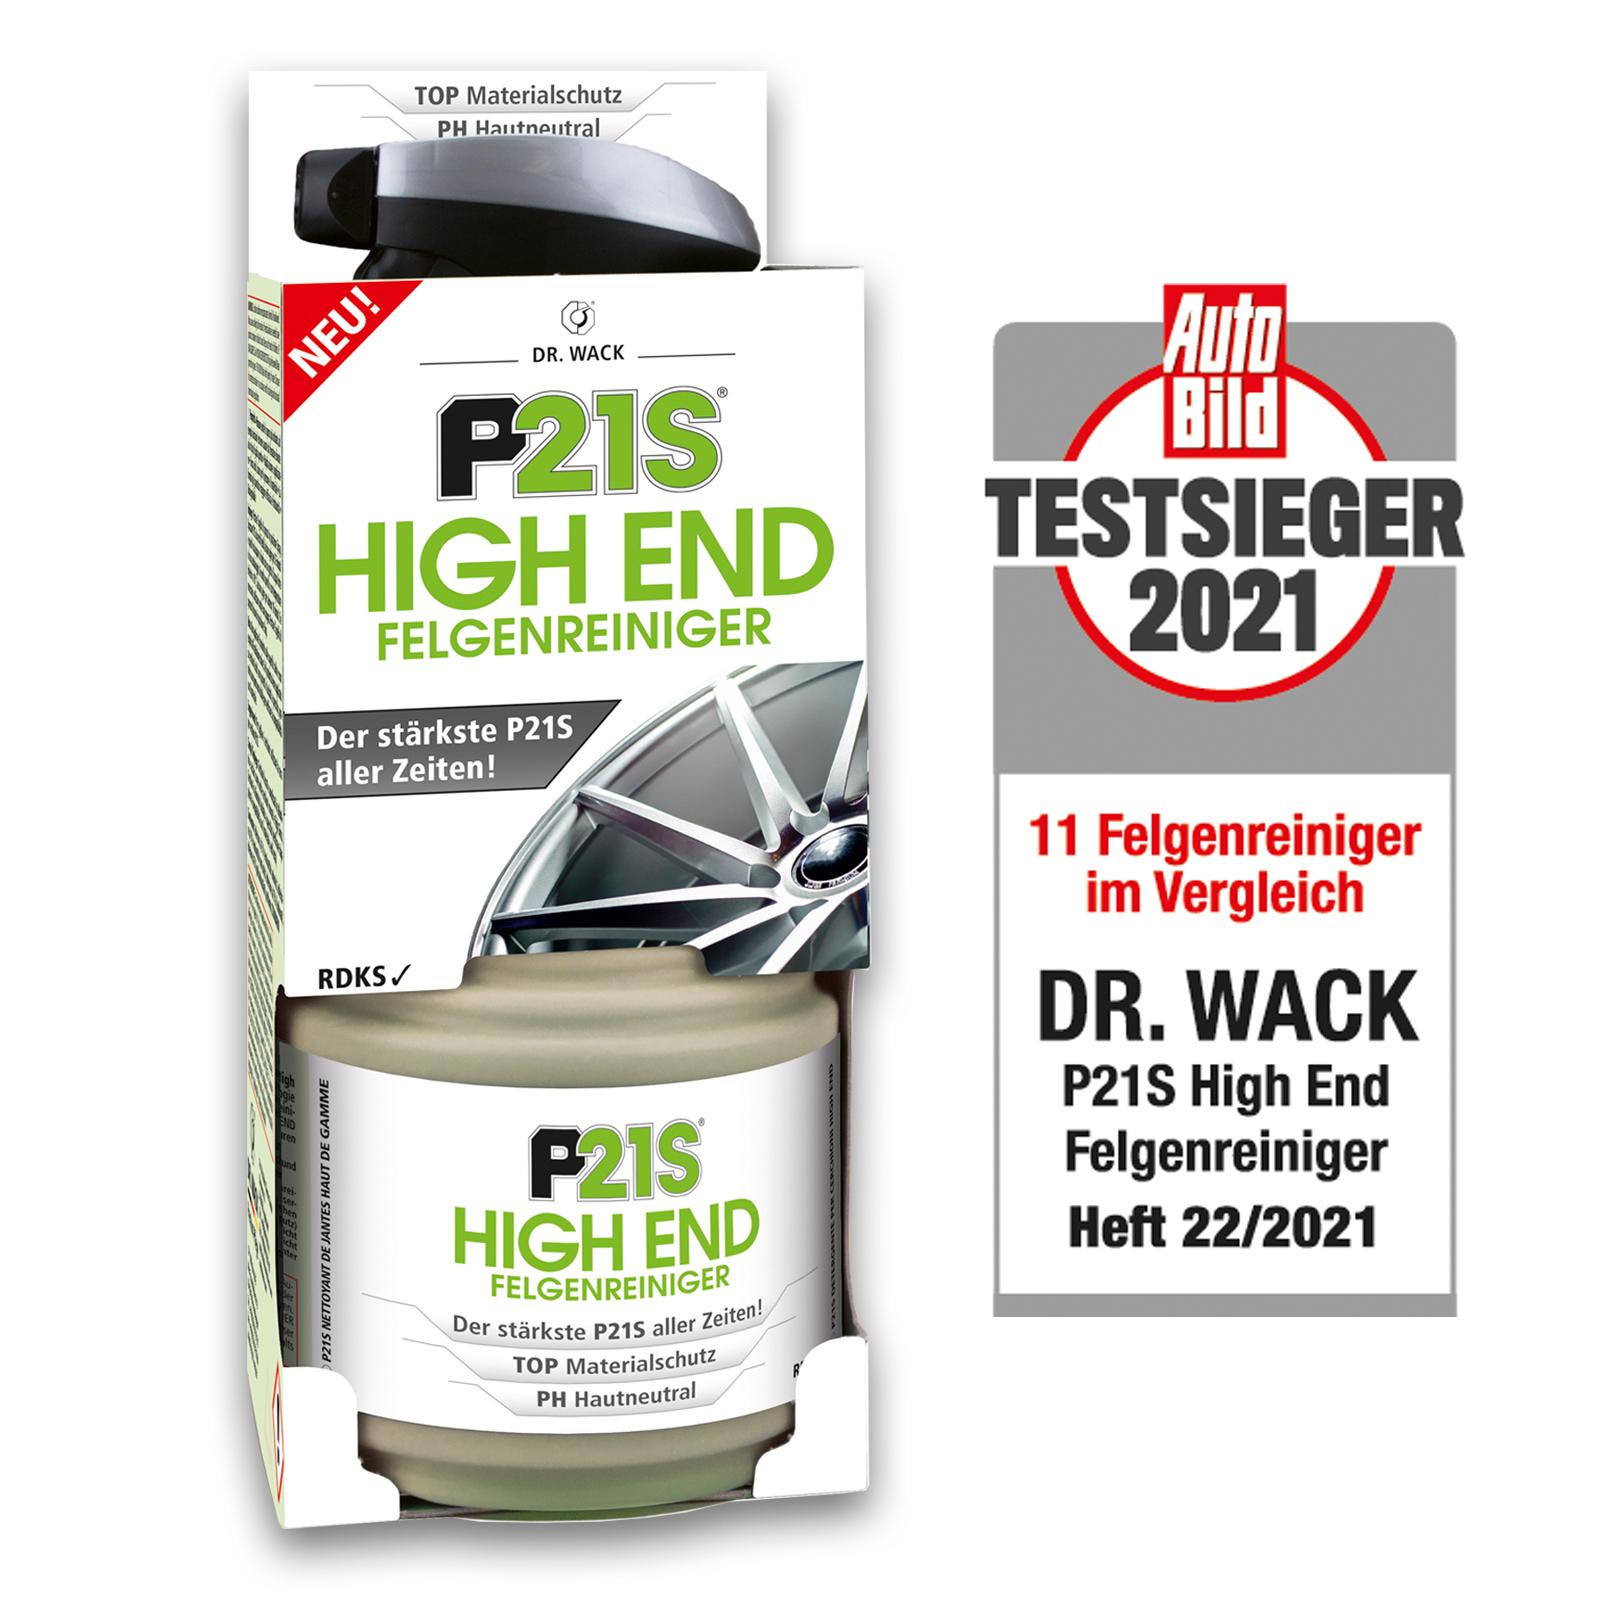 P21S High End Felgenreiniger